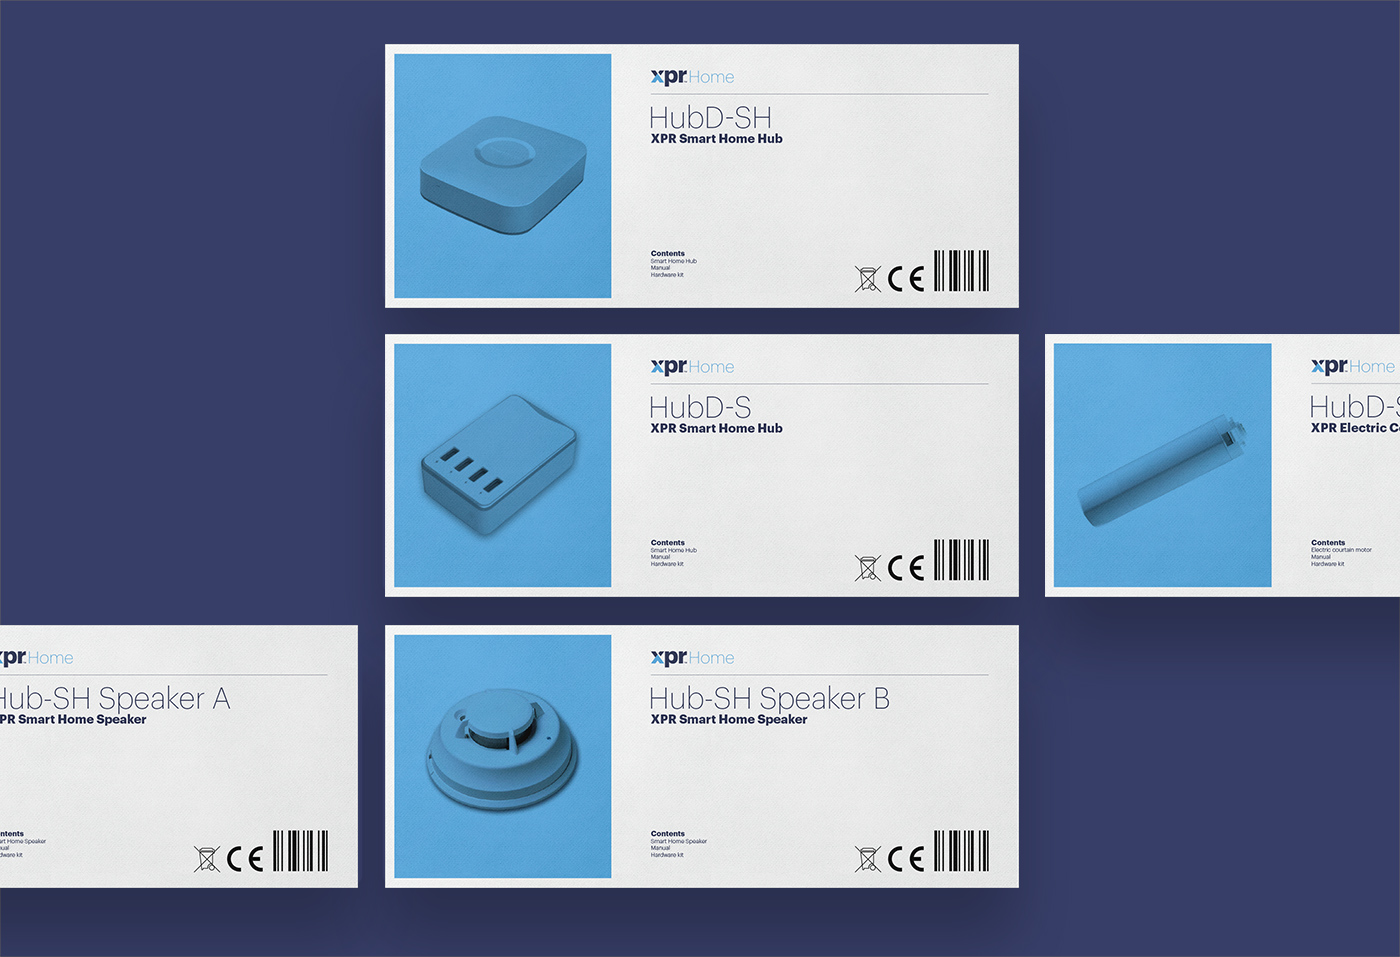 pixelarte-estudio-diseno-etiquetas_adhesivas-para-xpr